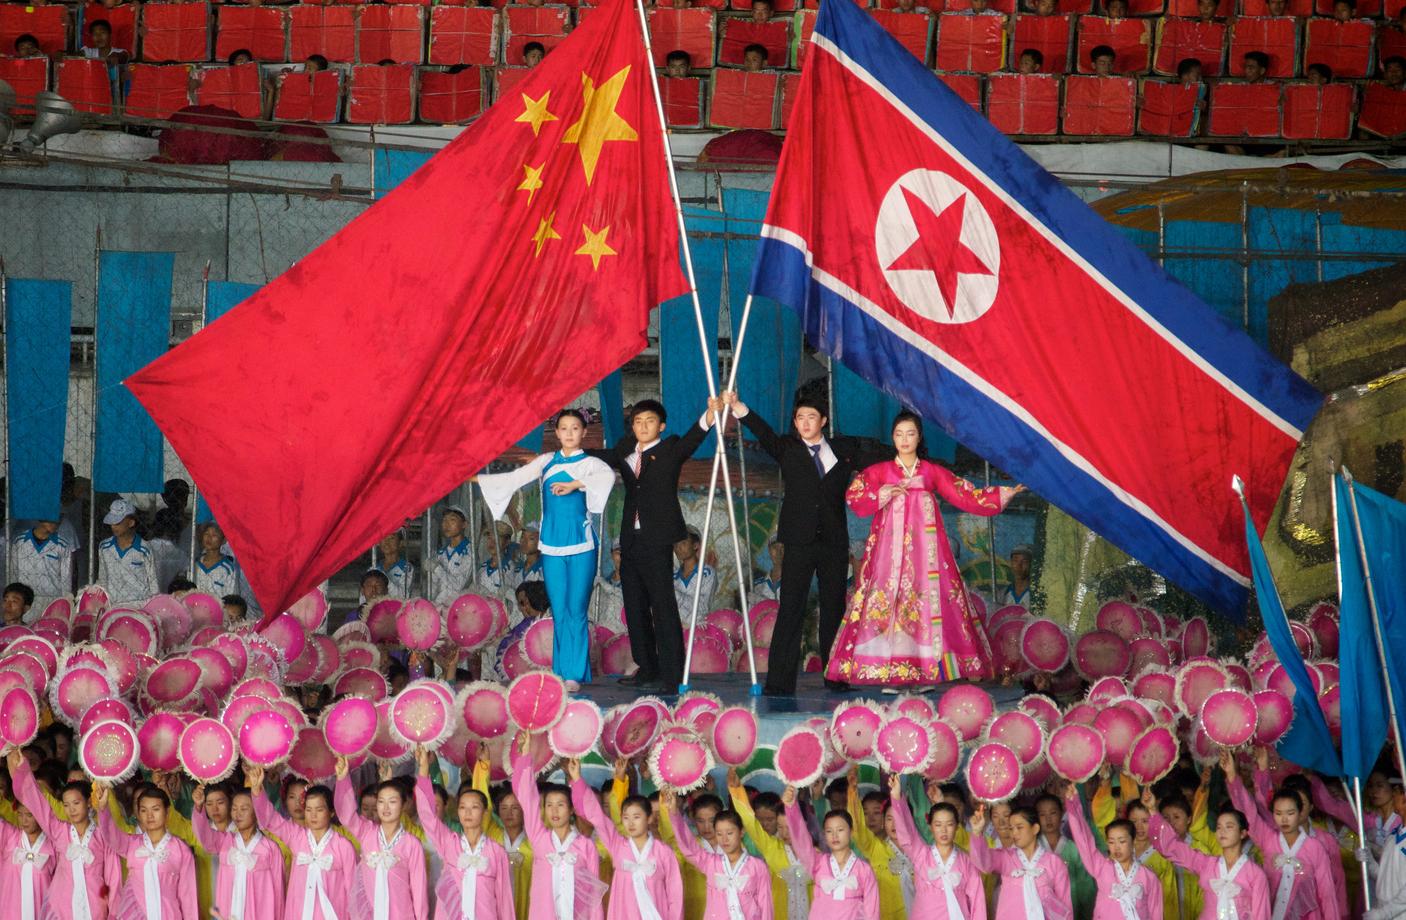 china and north korea relationship 2014 movies